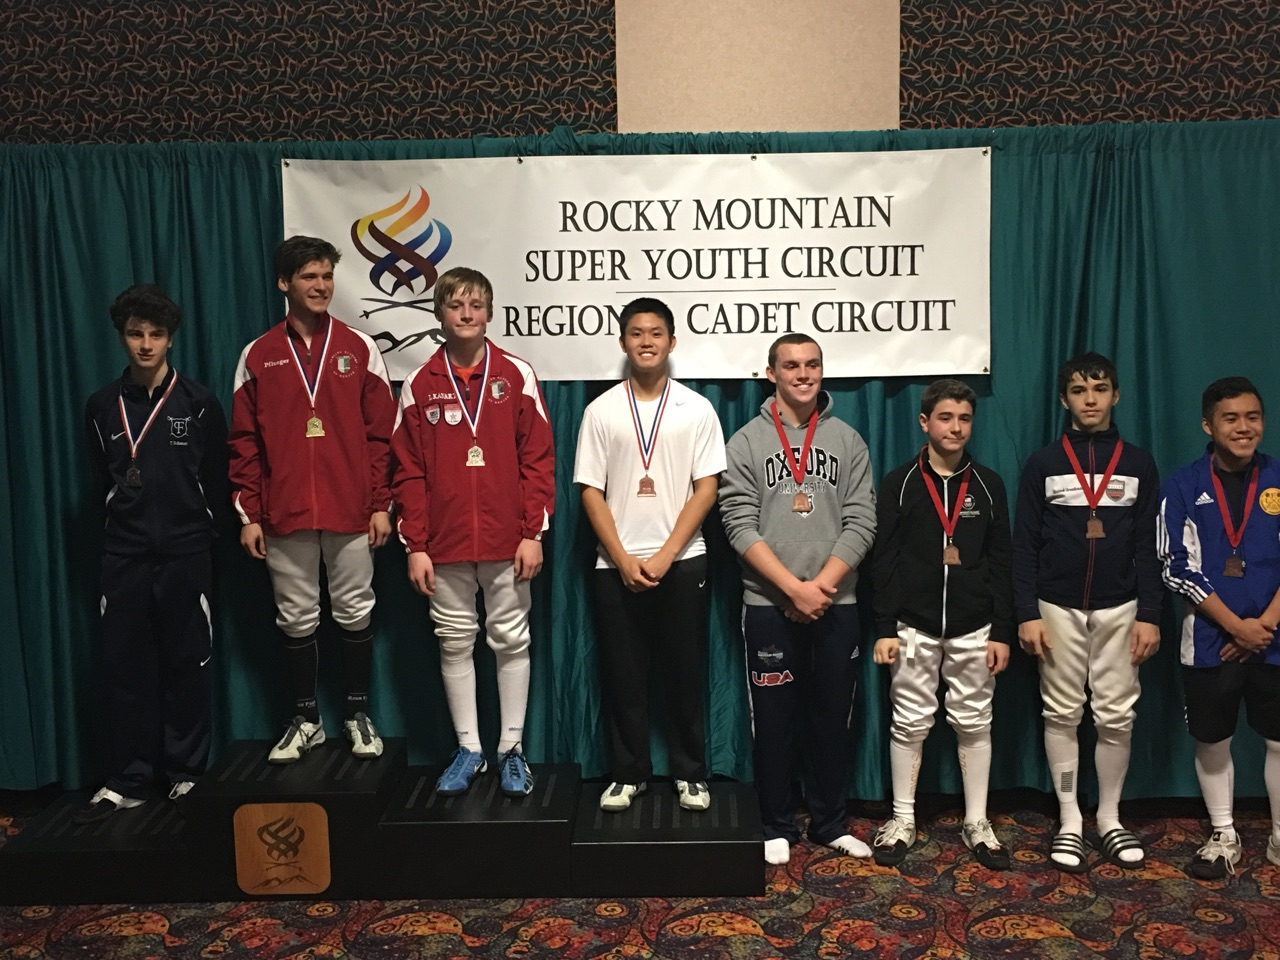 Trenton 2nd place